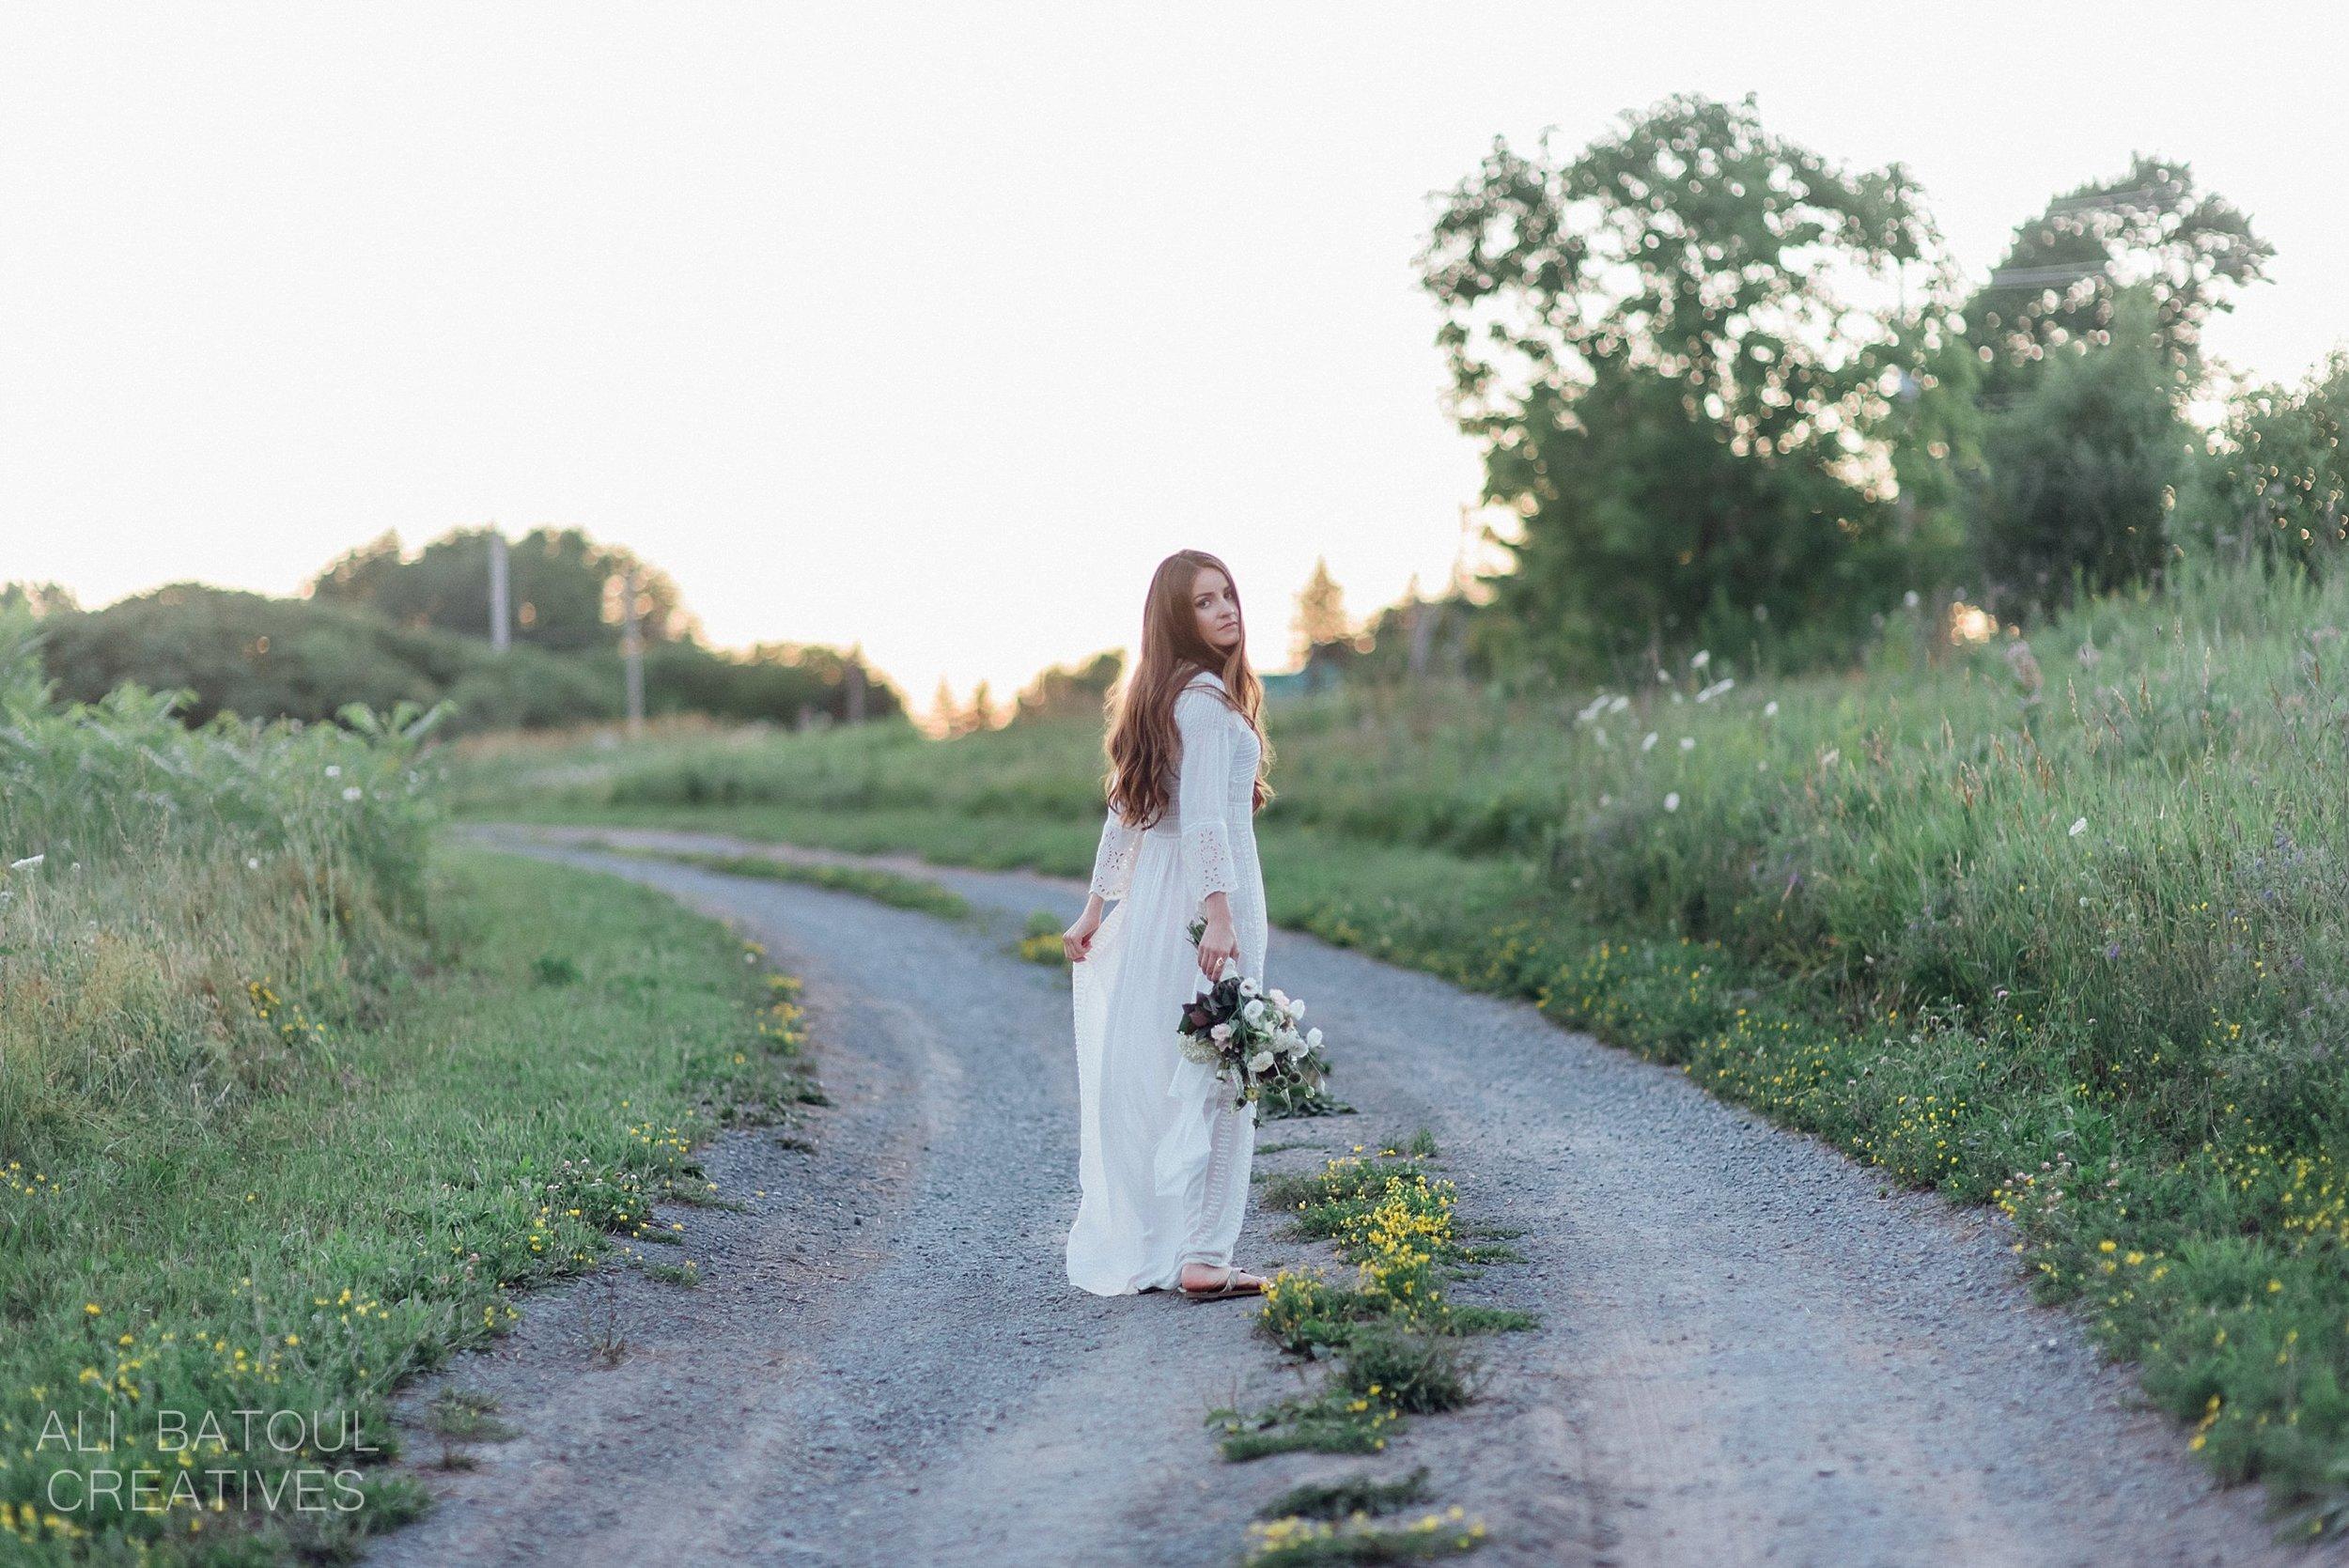 Boho Bridal Ottawa - Ali Batoul Creatives Fine Art Wedding Photography_0385.jpg